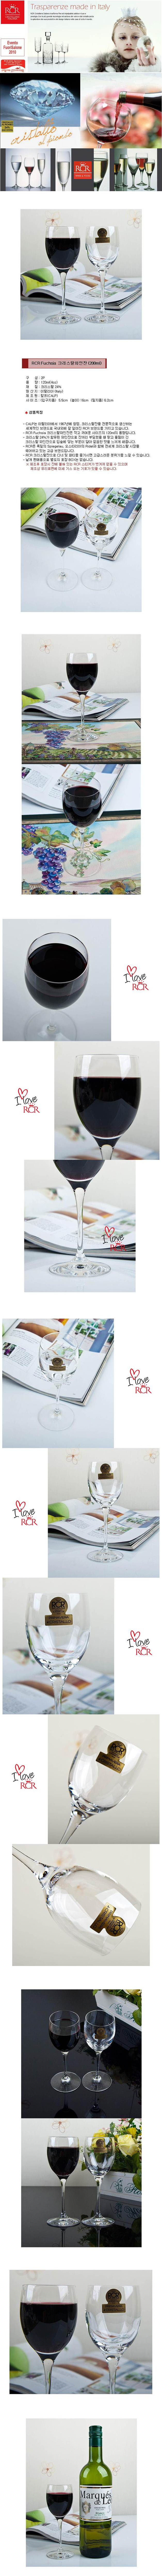 Fuchsia 크리스탈와인잔 2P (120ml) - 더리빙샵, 11,900원, 유리컵/술잔, 와인잔